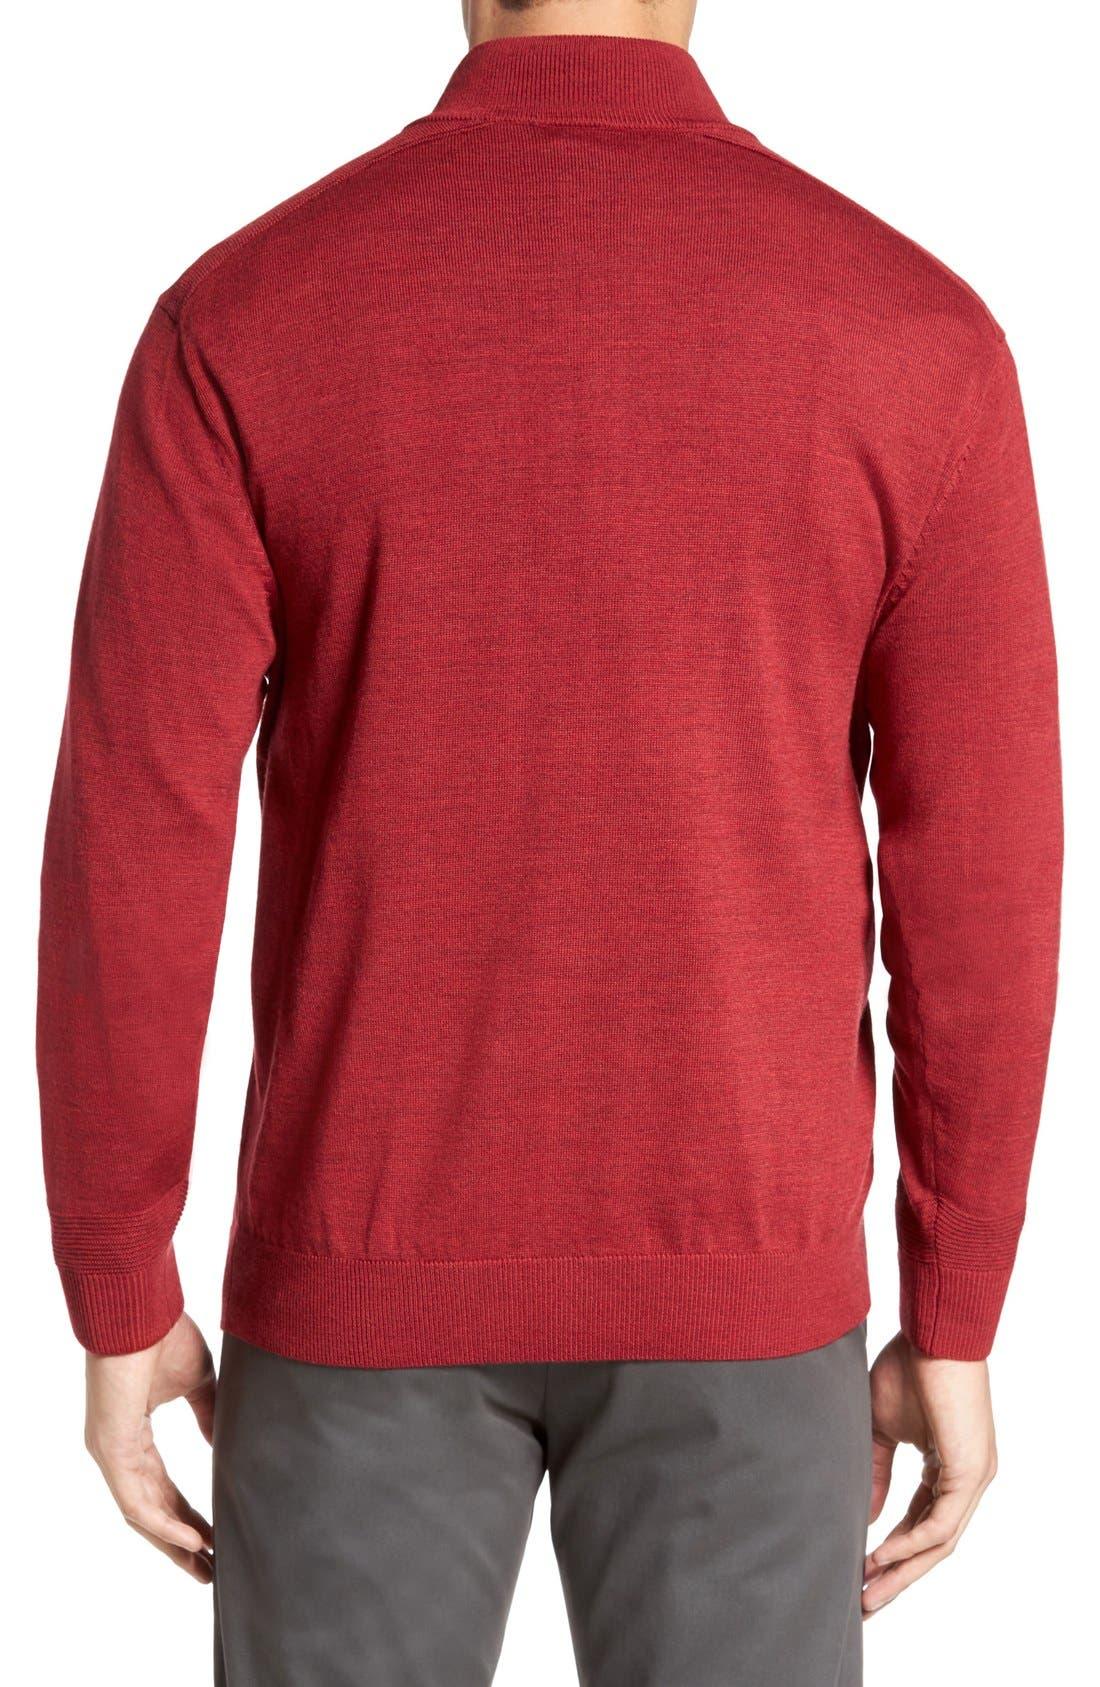 Douglas Quarter Zip Wool Blend Sweater,                             Alternate thumbnail 12, color,